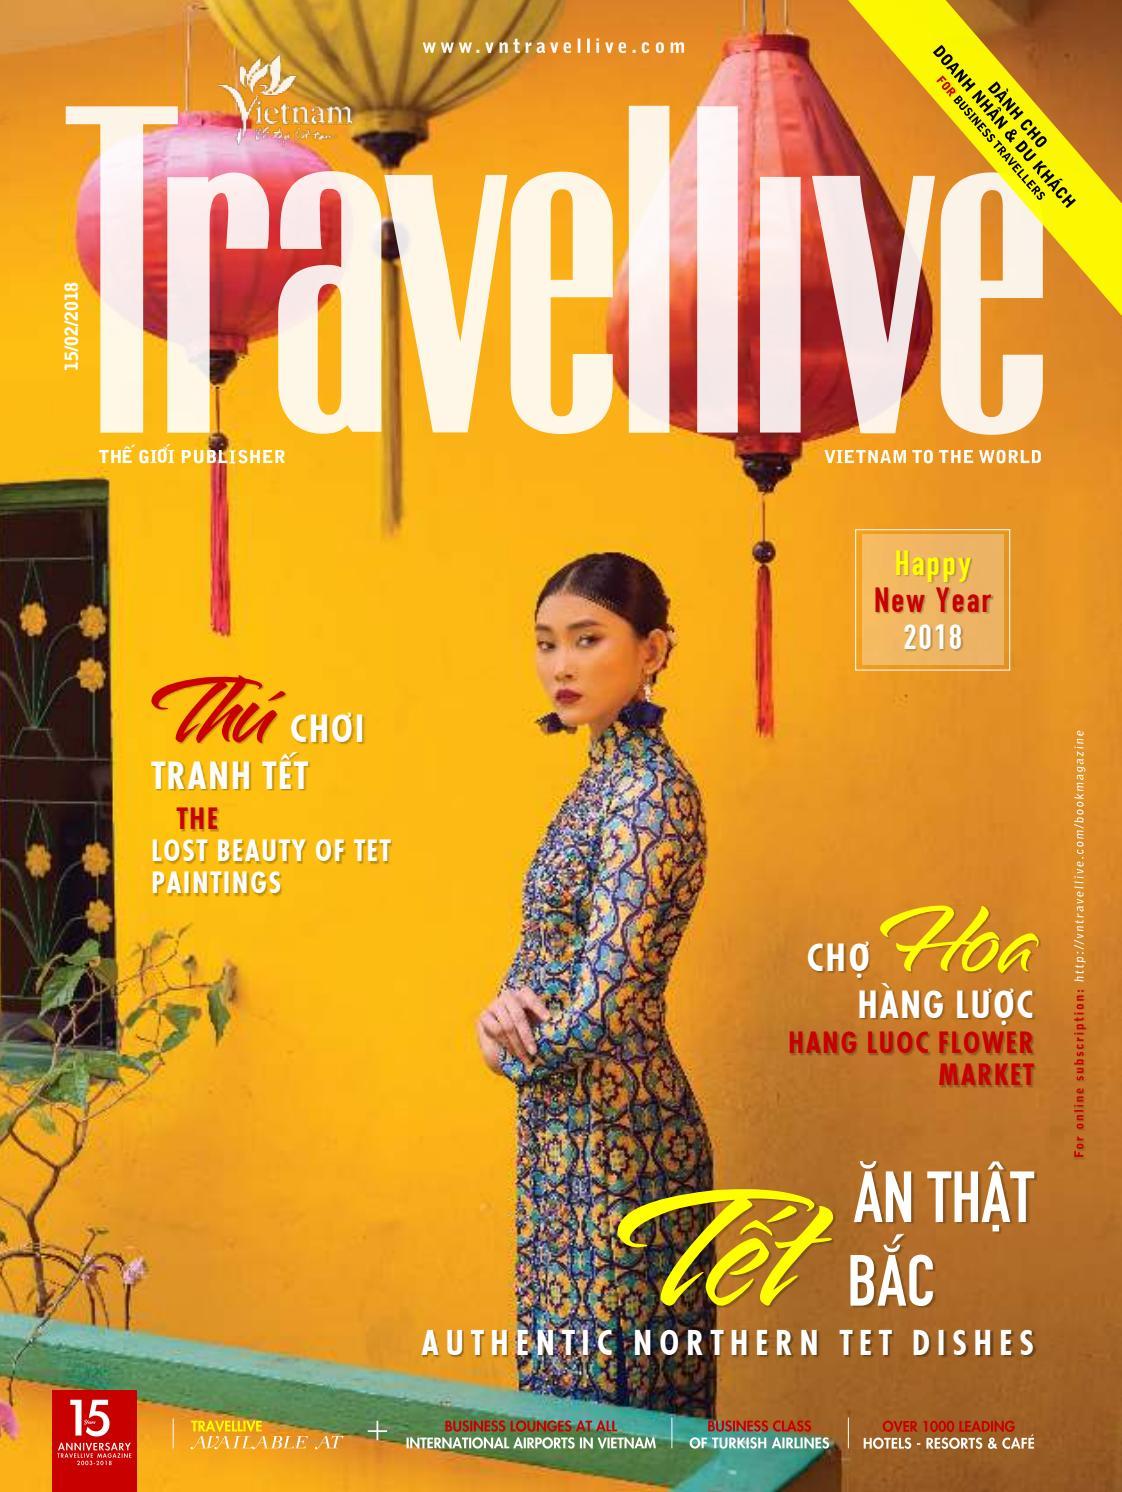 Travellive 2 - 2018 by Travellive Magazine - issuu